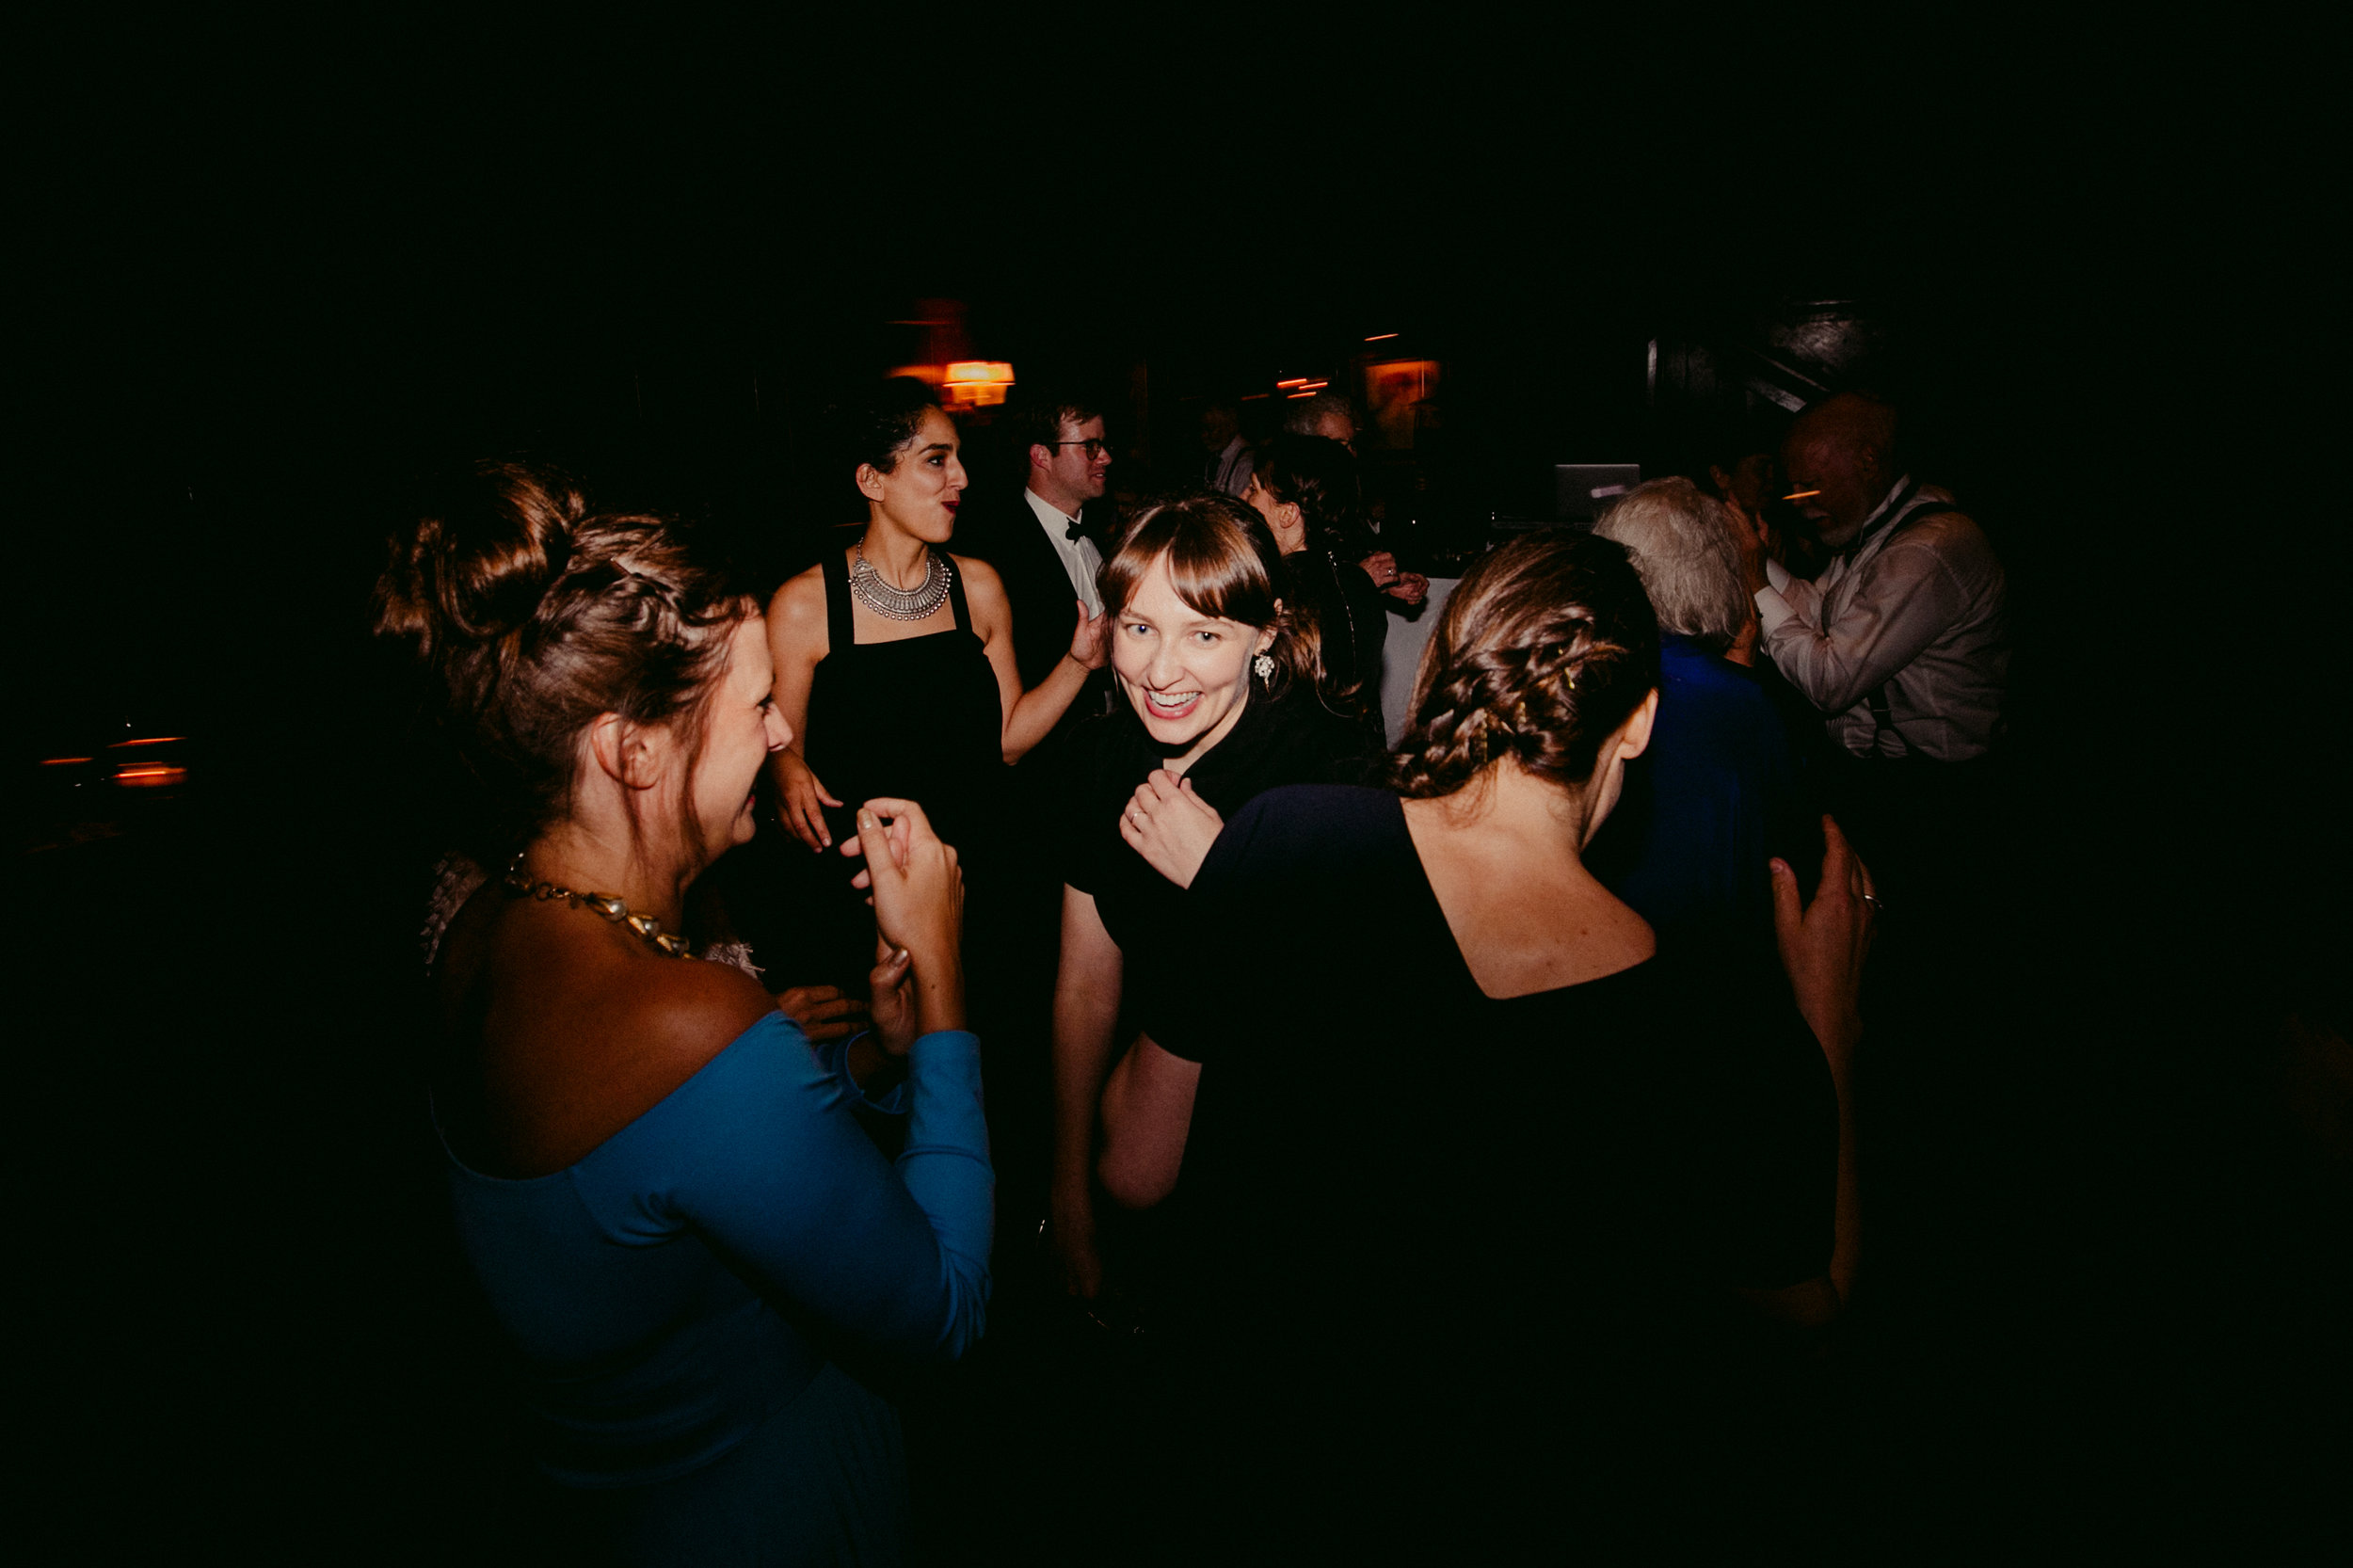 Tiger_House_The_Inn_at_Hudson-Wedding_Chellise_Michael_Photography-467.jpg